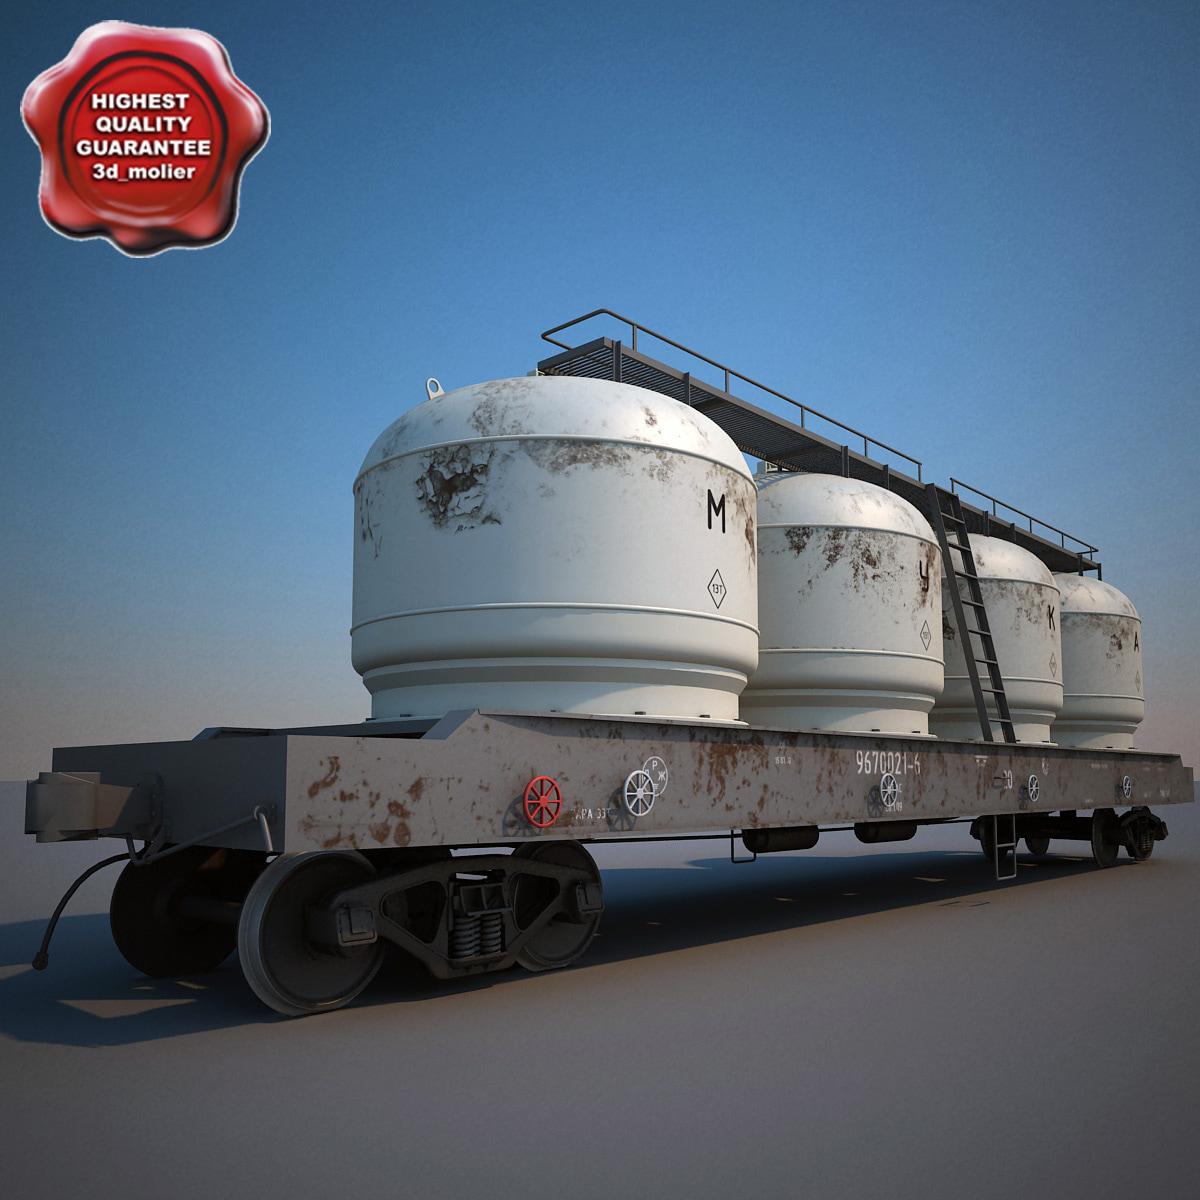 Hopper_Wagon_17-4020_00.jpg